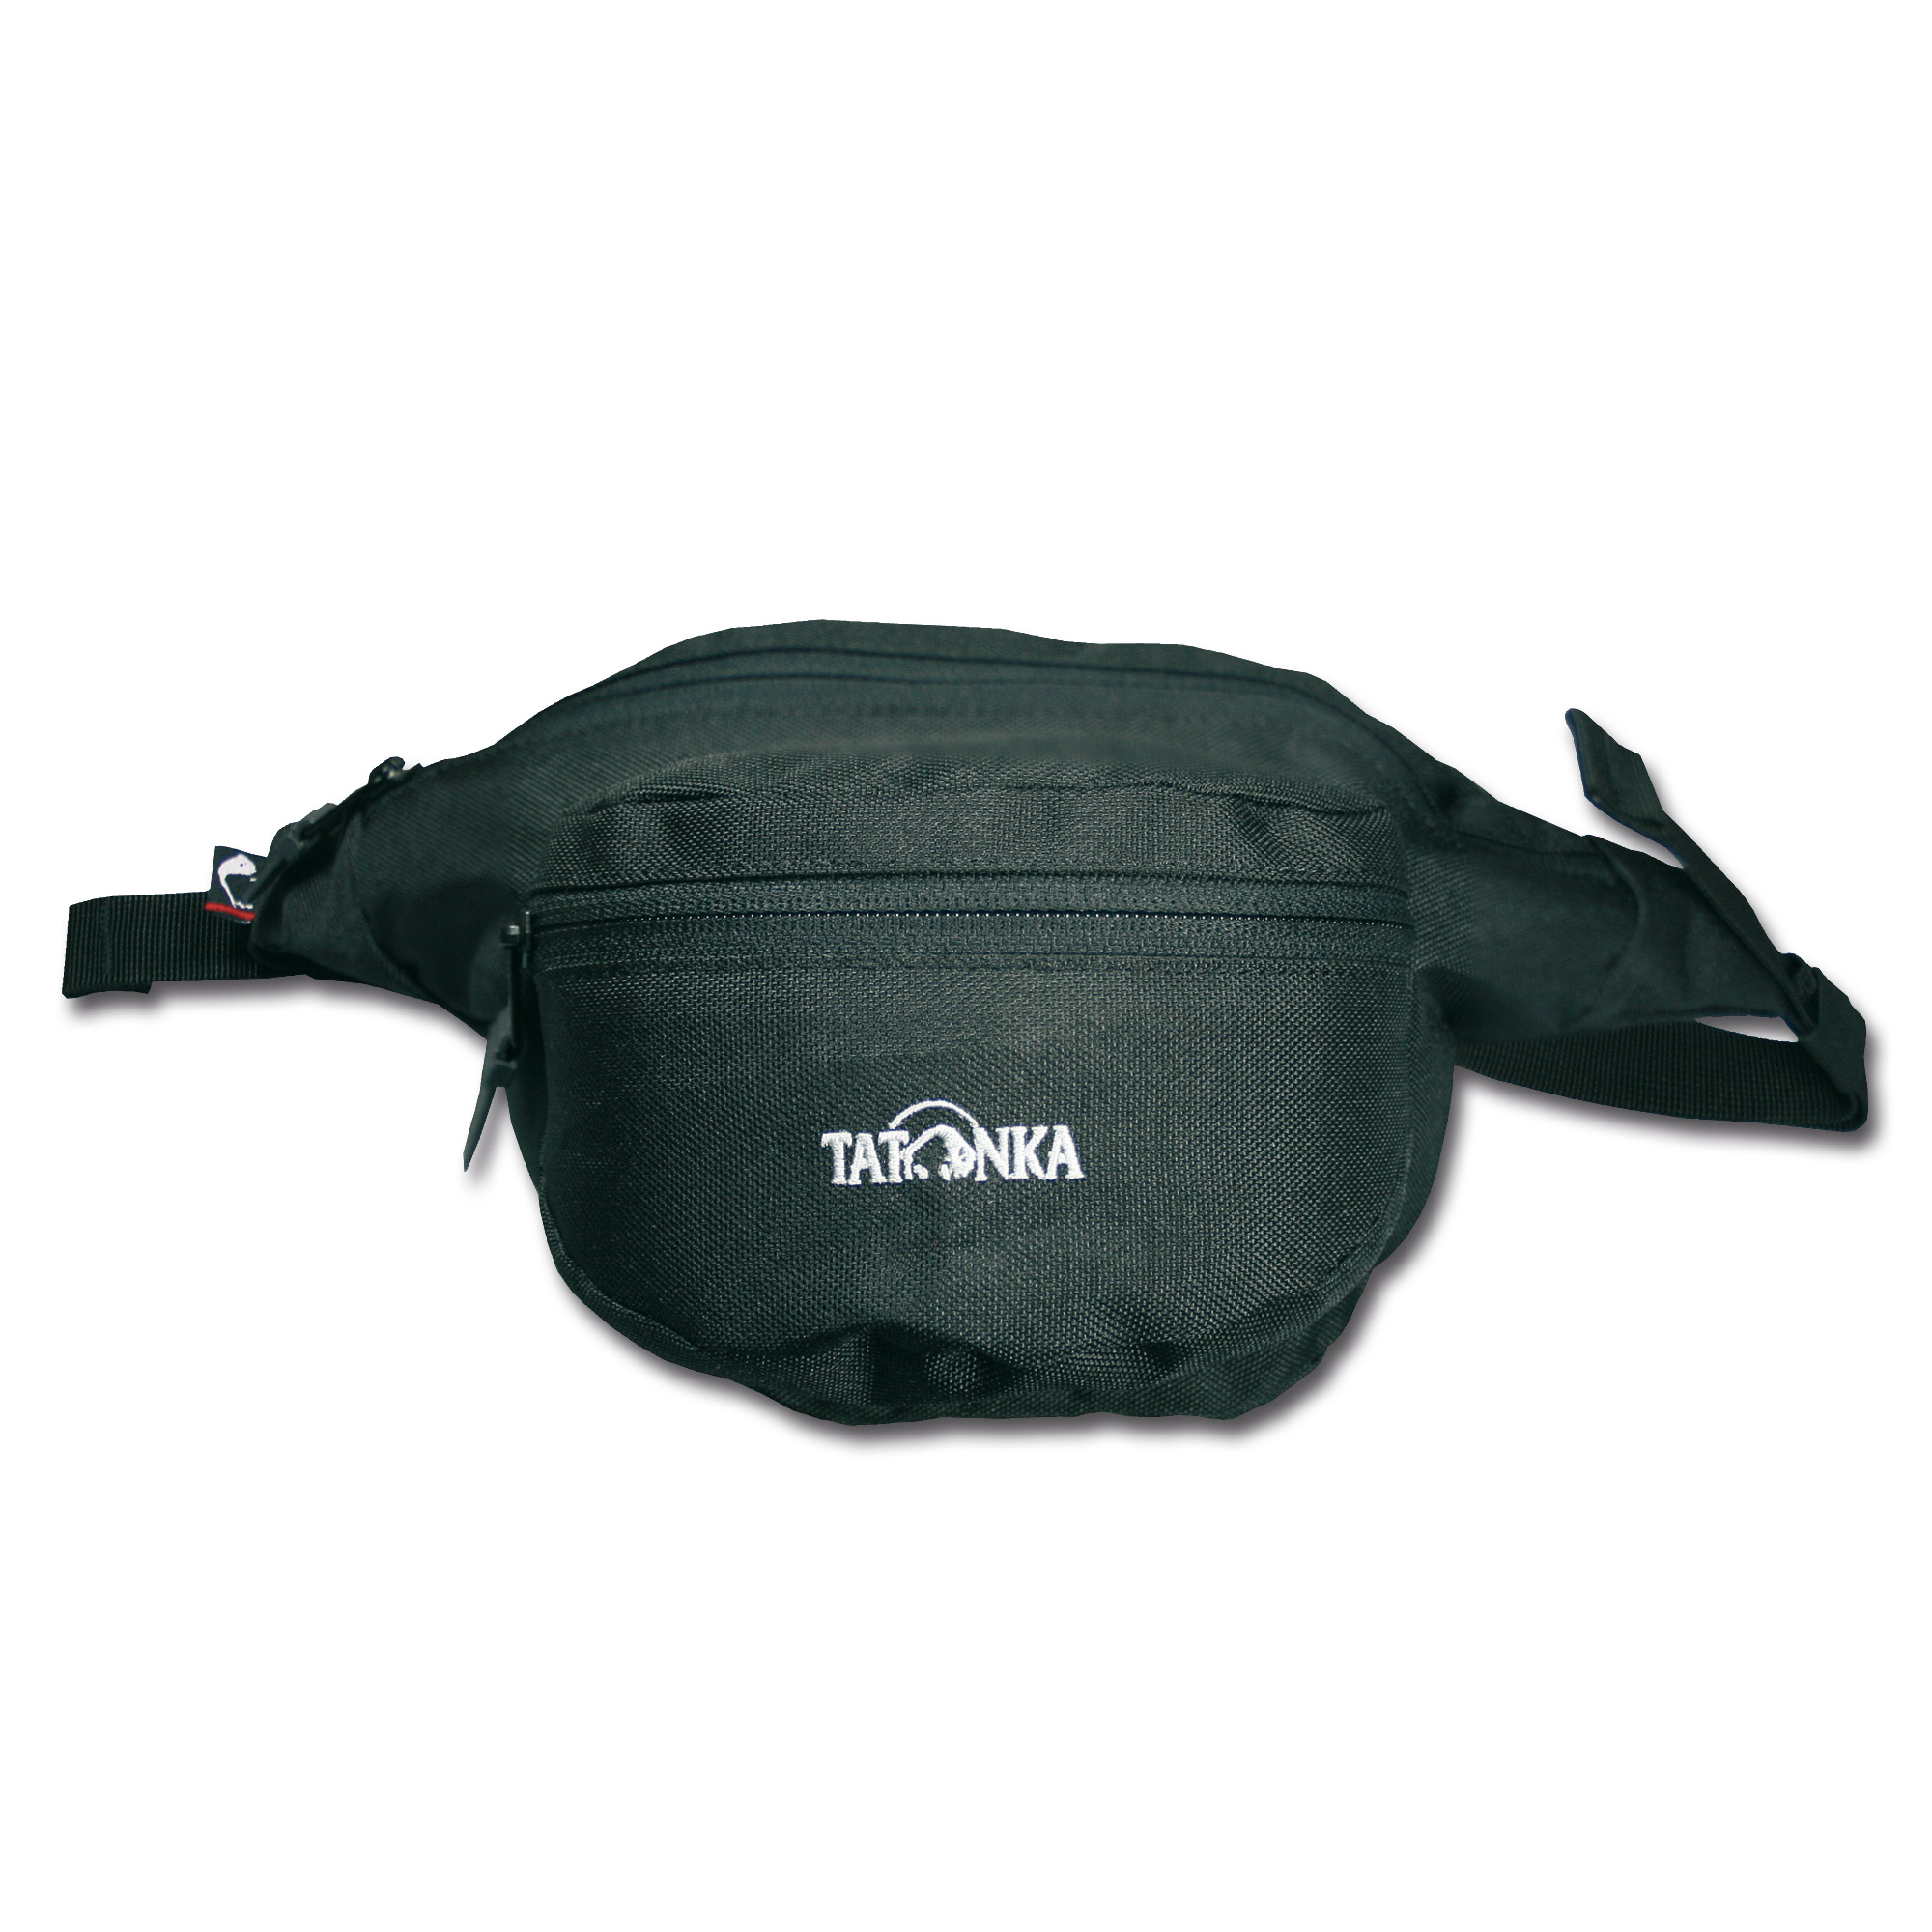 Funny Bag Tatonka S schwarz